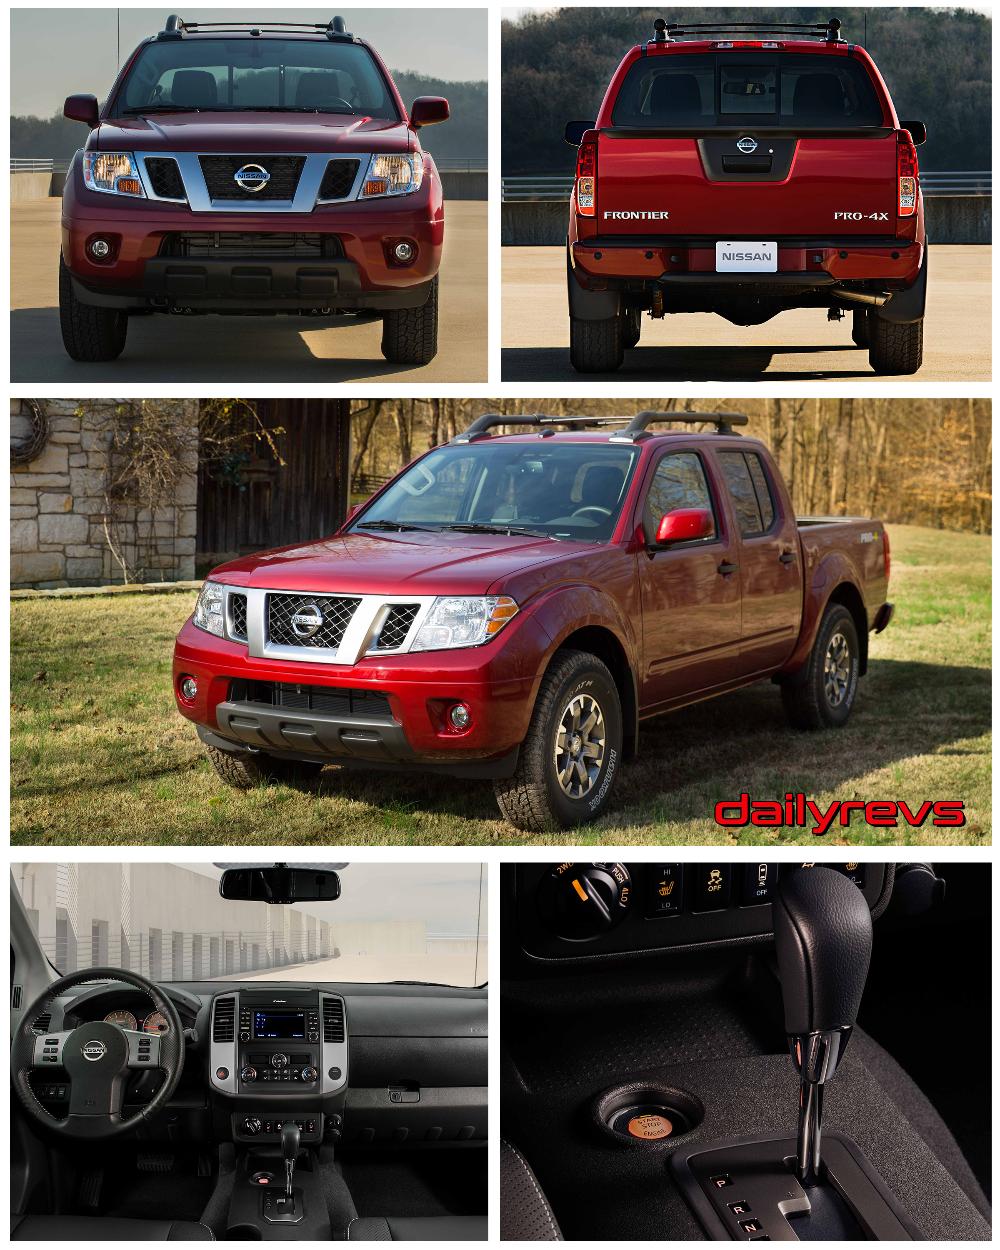 2020 Nissan Frontier HD Pictures, Videos, Specs